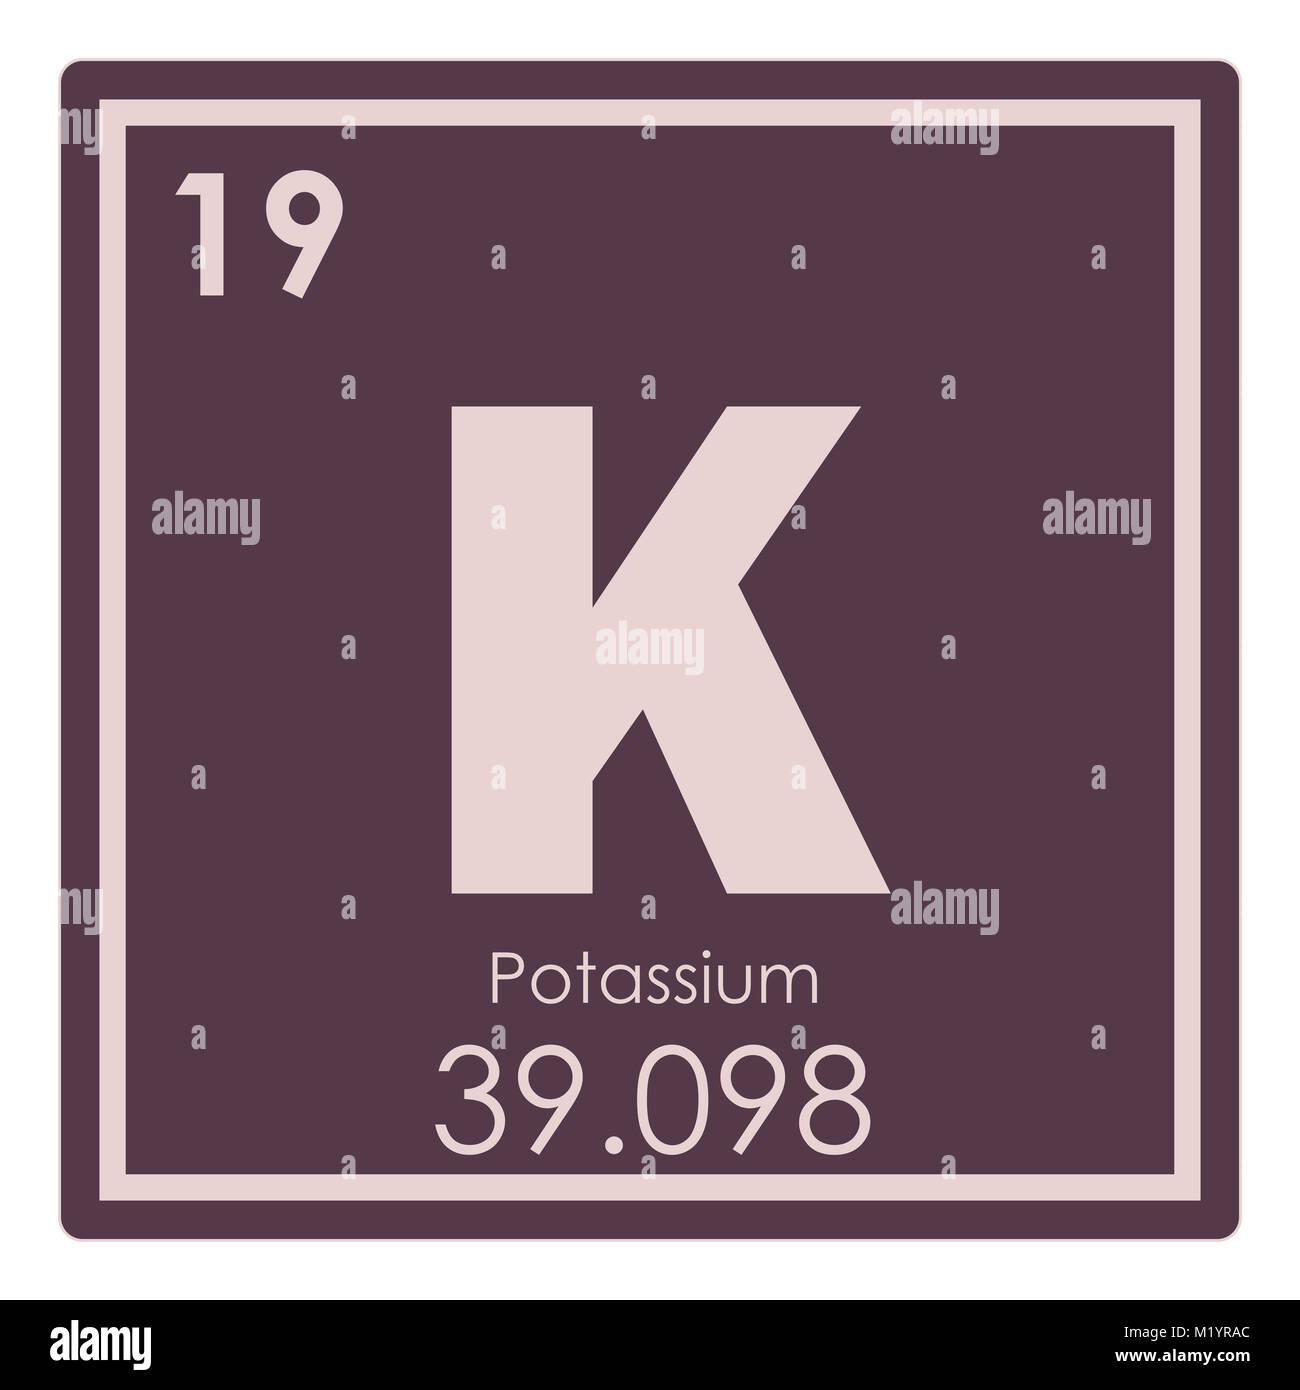 Potassium Chemical Element Periodic Table Science Symbol Stock Photo